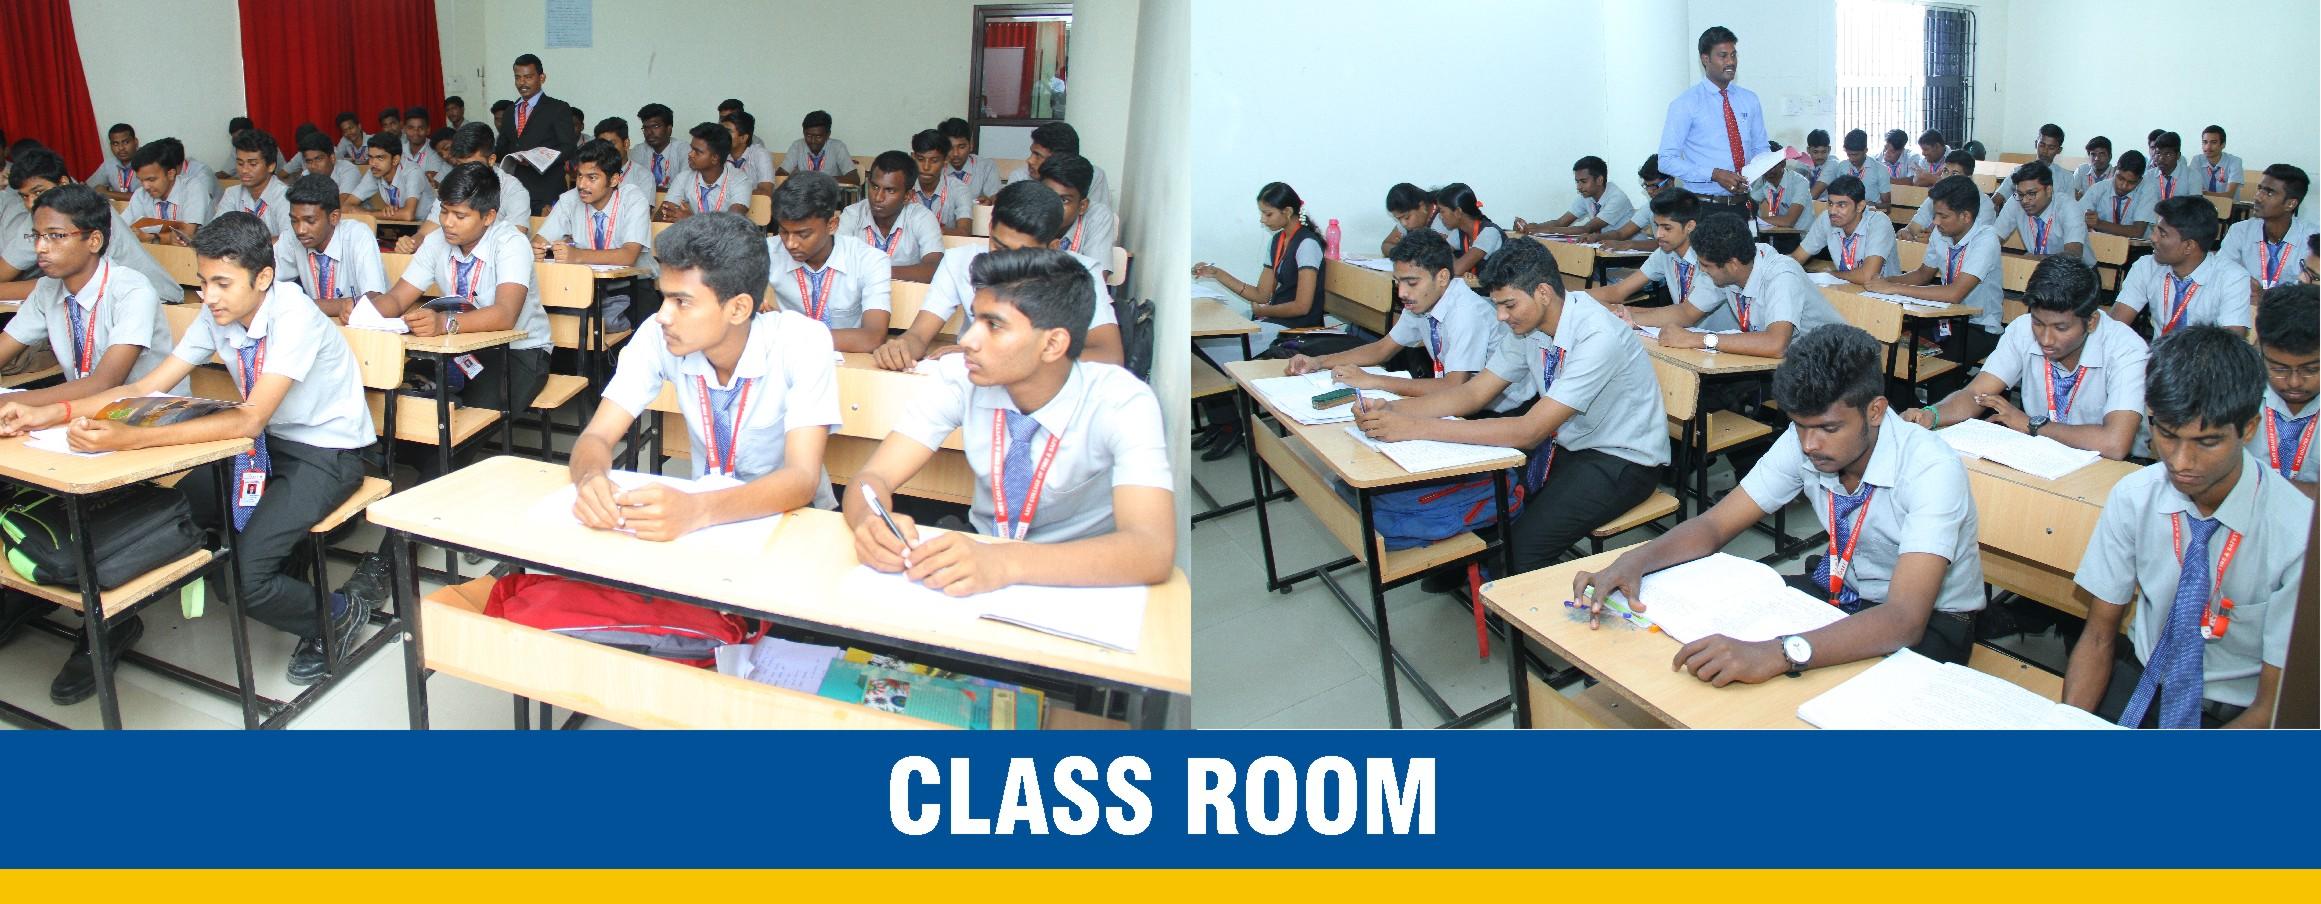 Aset Class Room